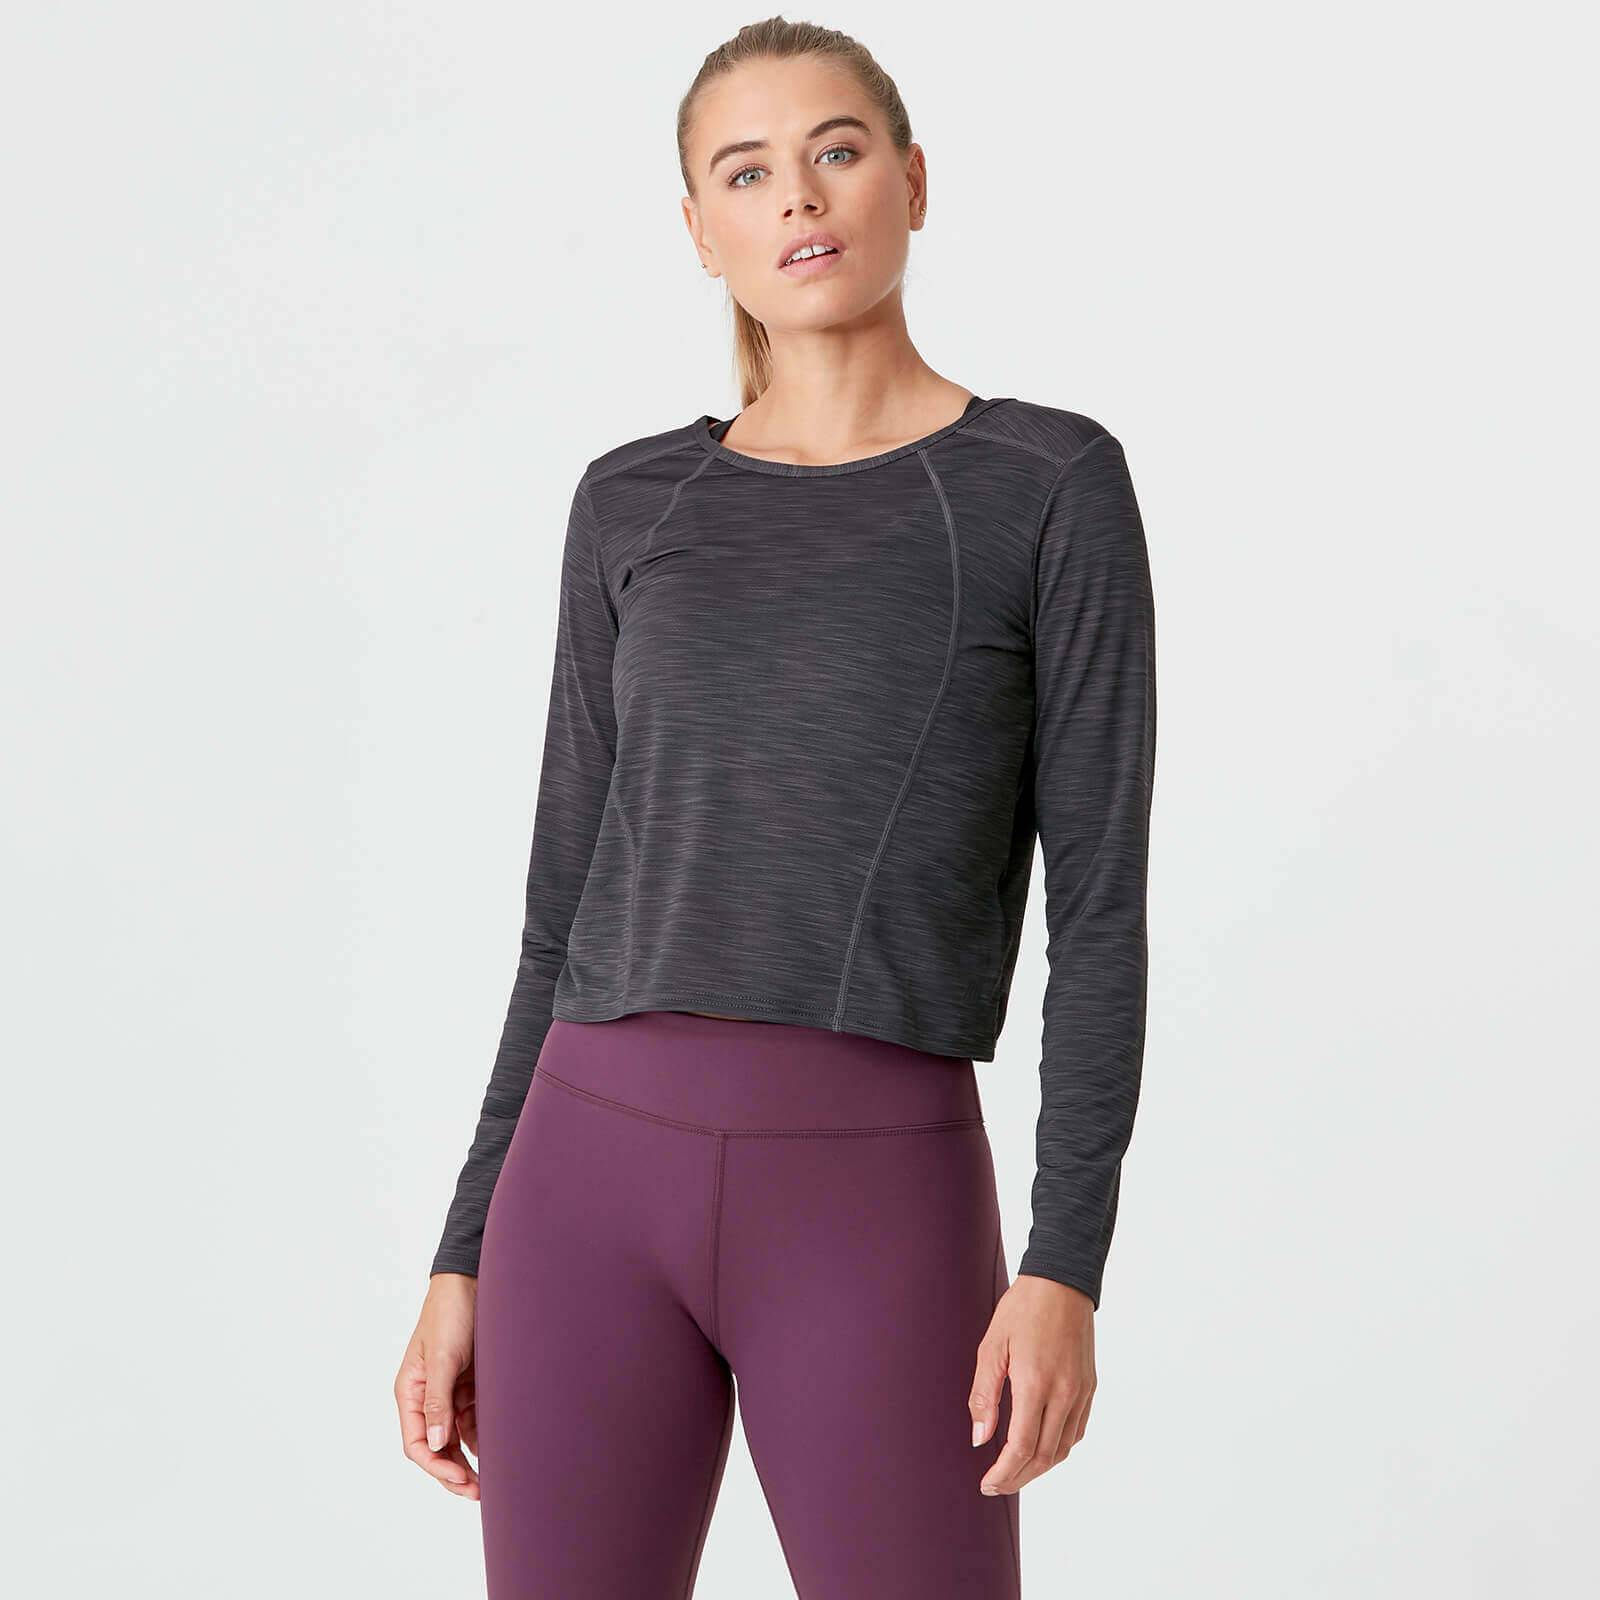 Myprotein Dry-Tech Long Sleeve T-Shirt - Slate Grey - L